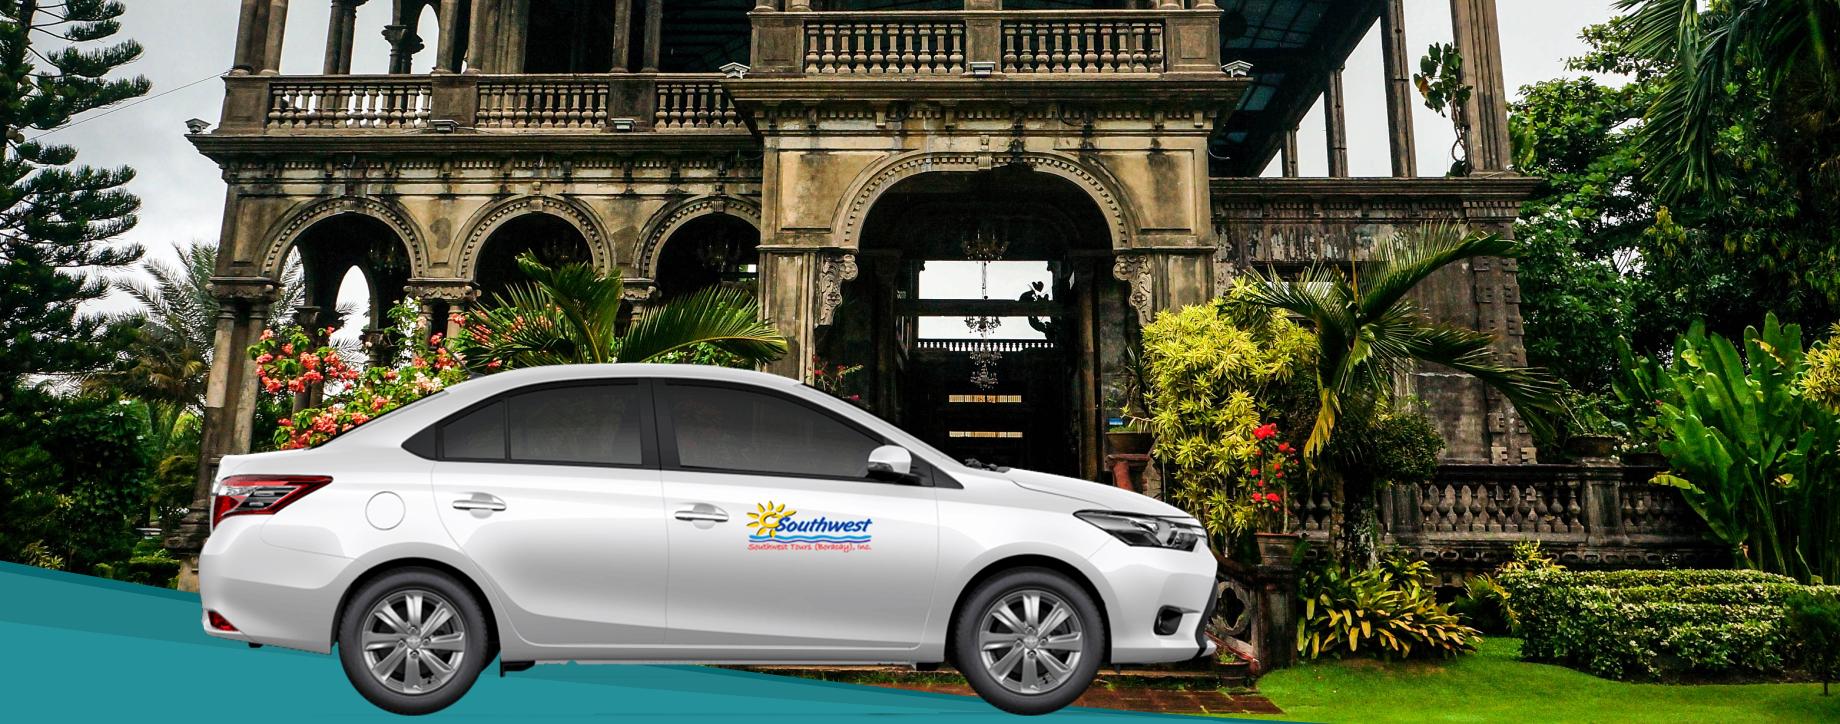 Bacolod City to Bago/Victorias/Valladolid Private Car Transfer